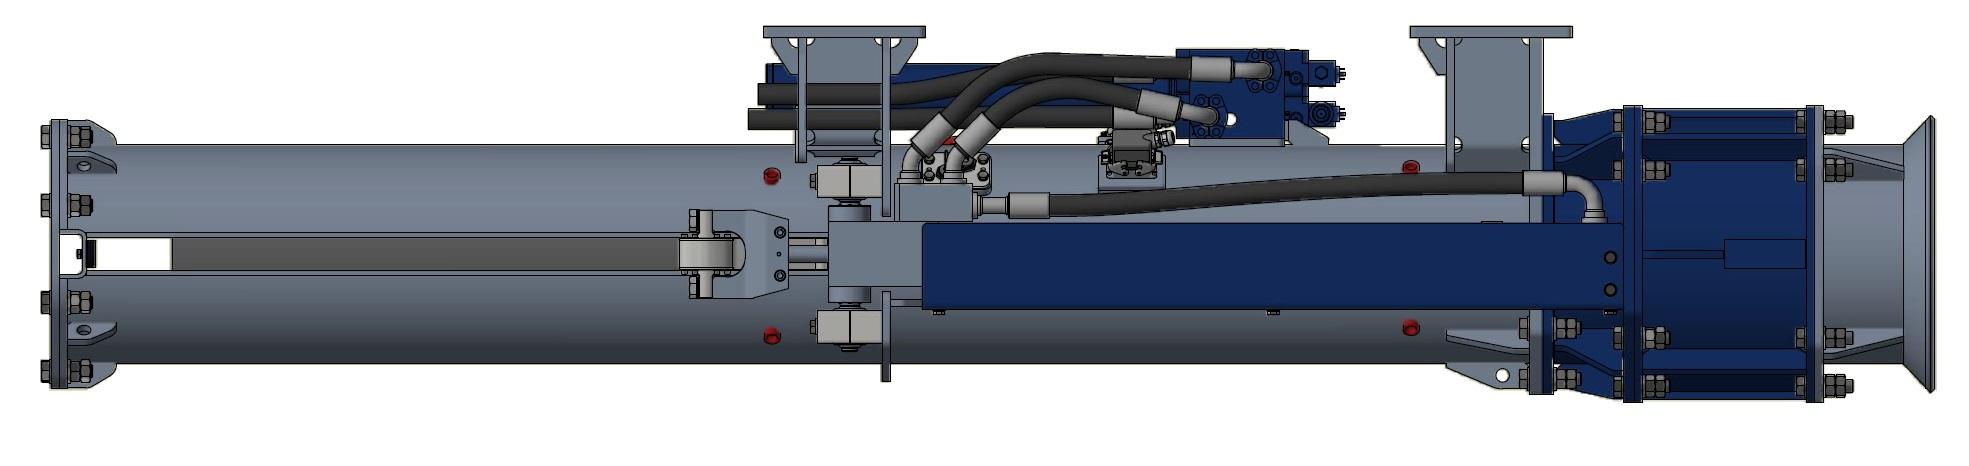 INPIEQ hydraulic impact hammer